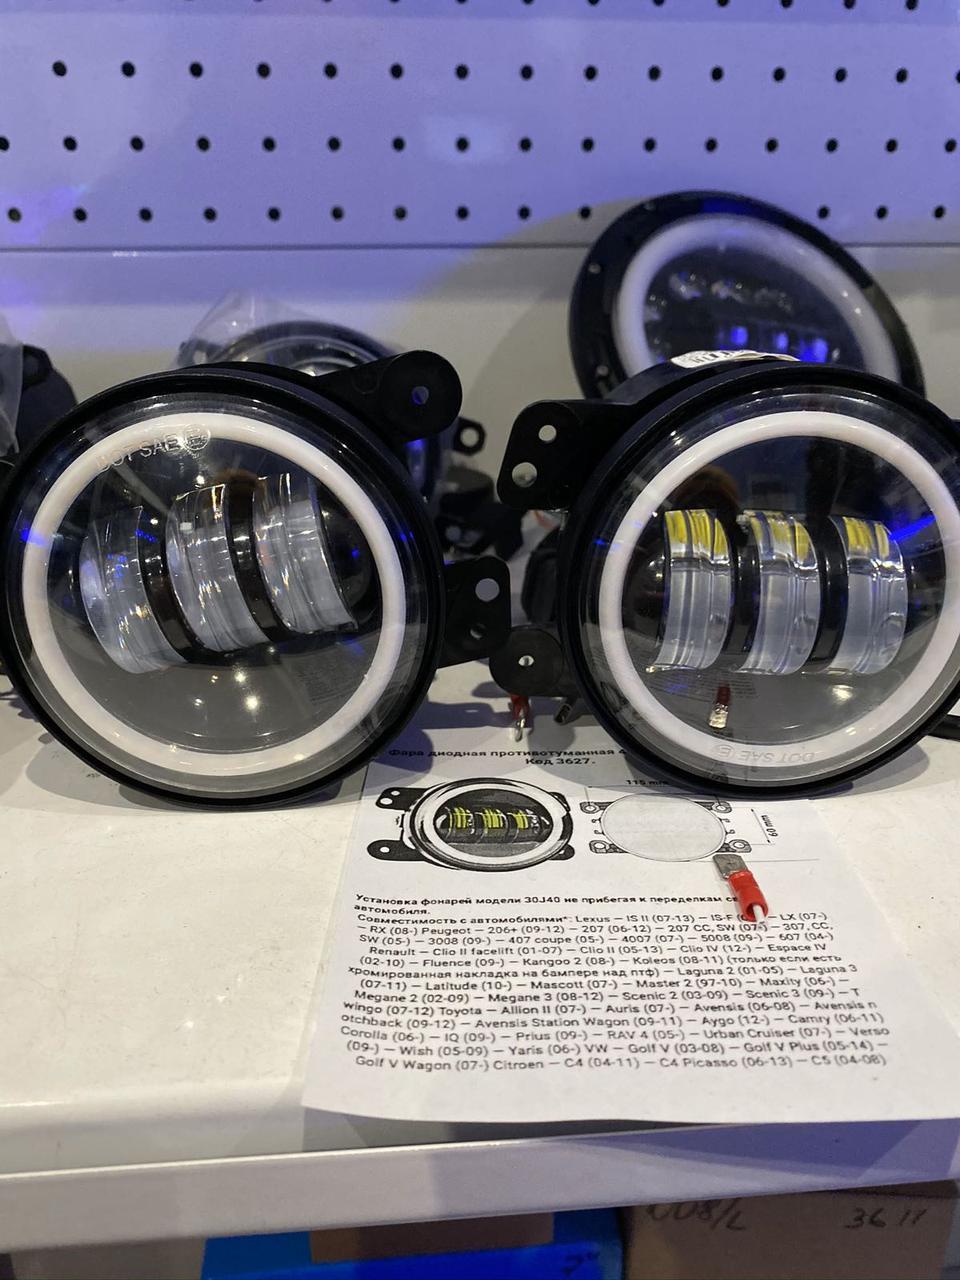 Фары диодные противотуманные LED фары 30W с четкой СТГ  4 дюйма